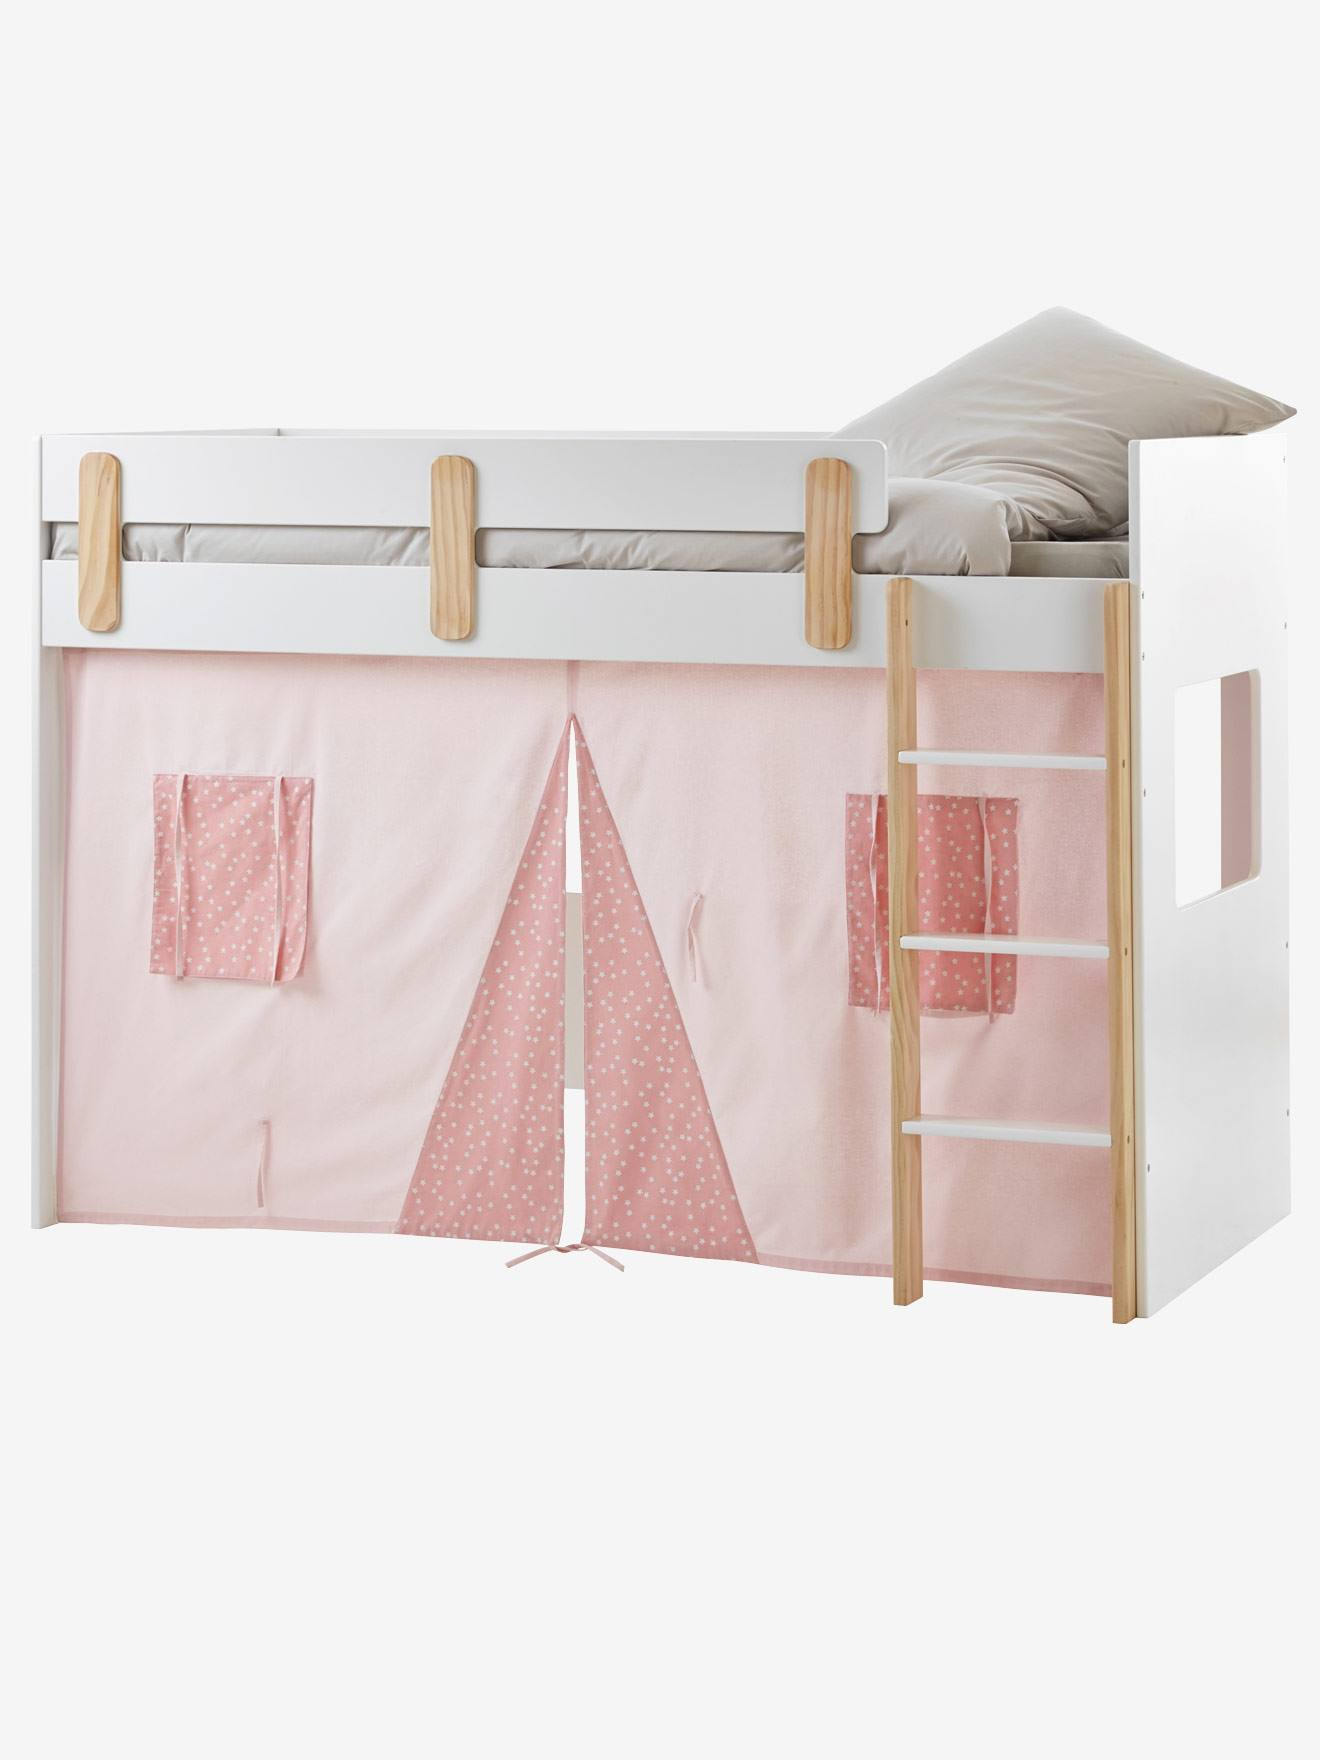 Bettvorhang Für Kinder Hochbett Blau/Bedruckt+Rosa/Bedruckt